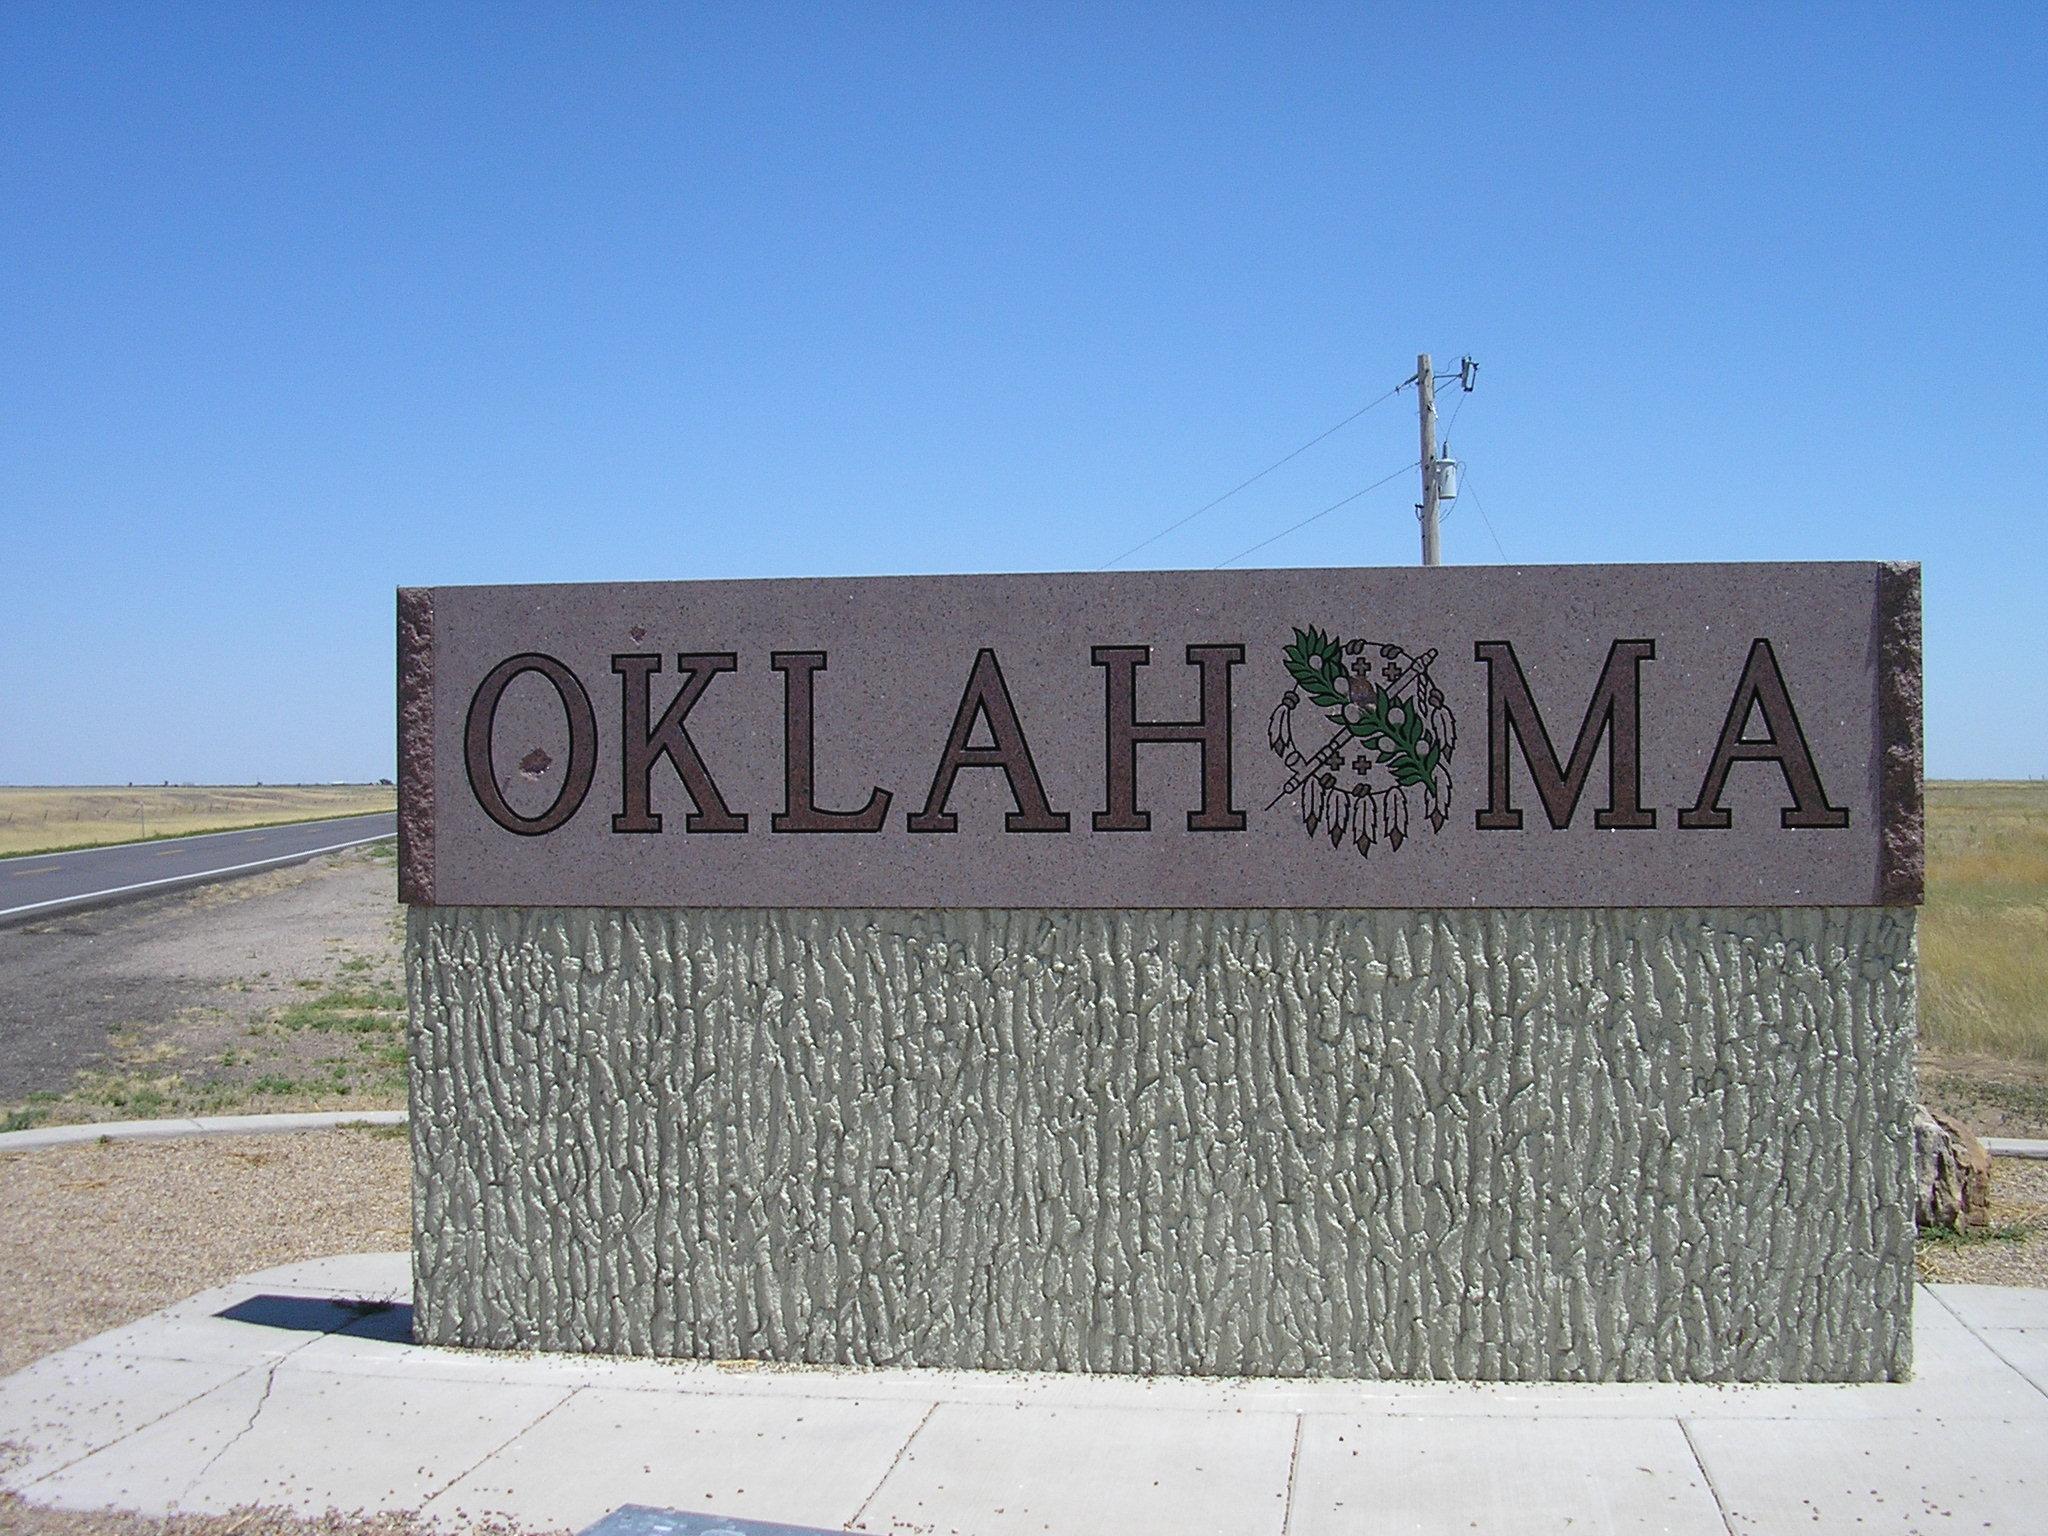 Oklahoma hb 1330